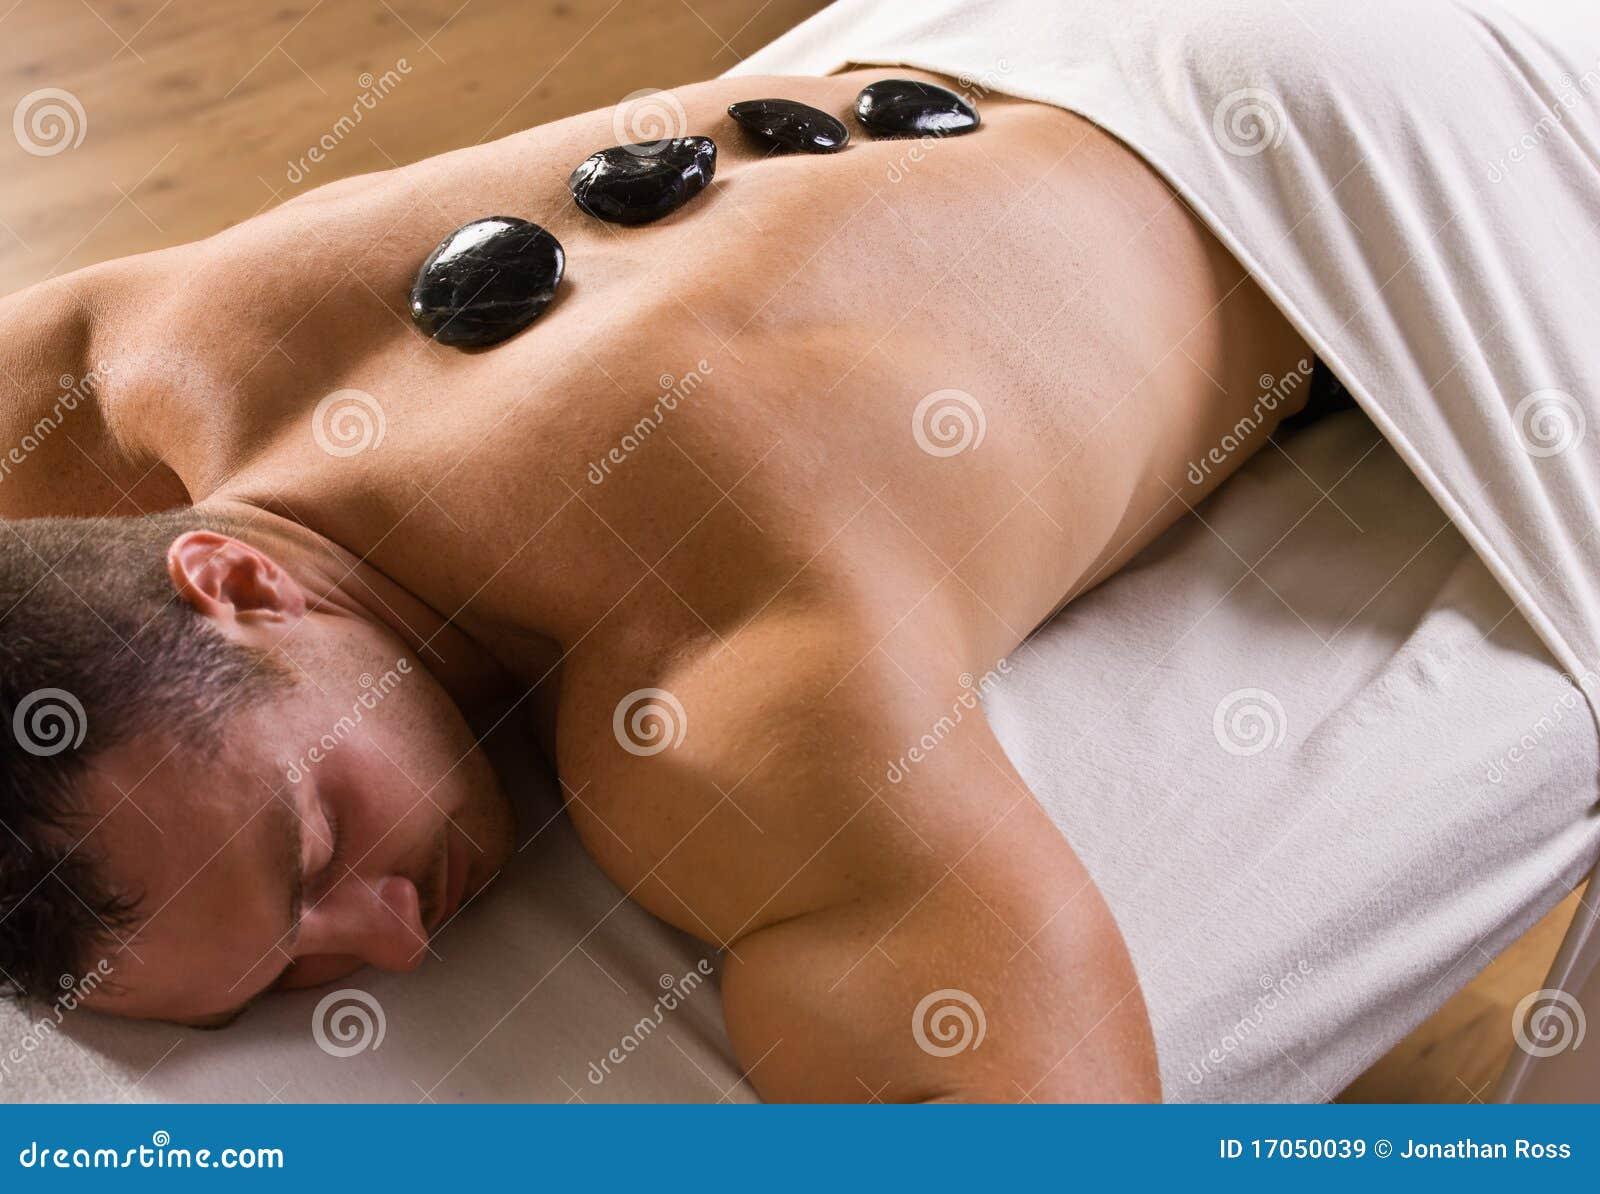 Nude tits mature hairy latina milf pics